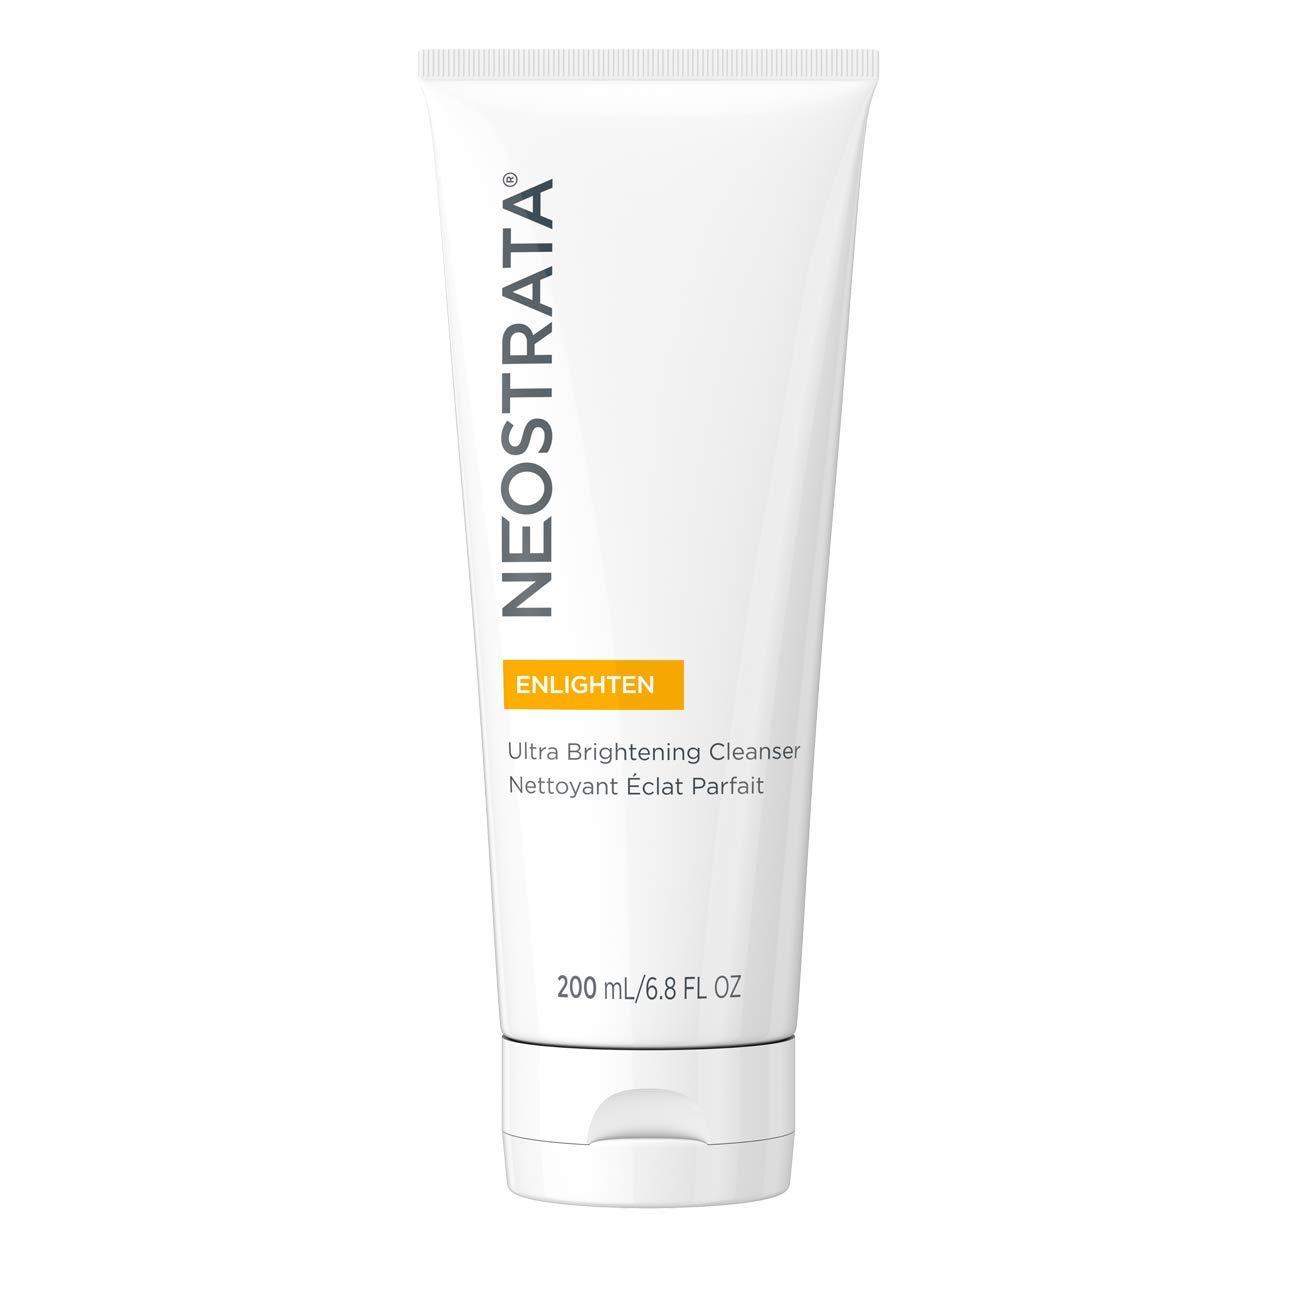 NEOSTRATA ENLIGHTEN's Ultra Brightening Gentle Facial Cleanser